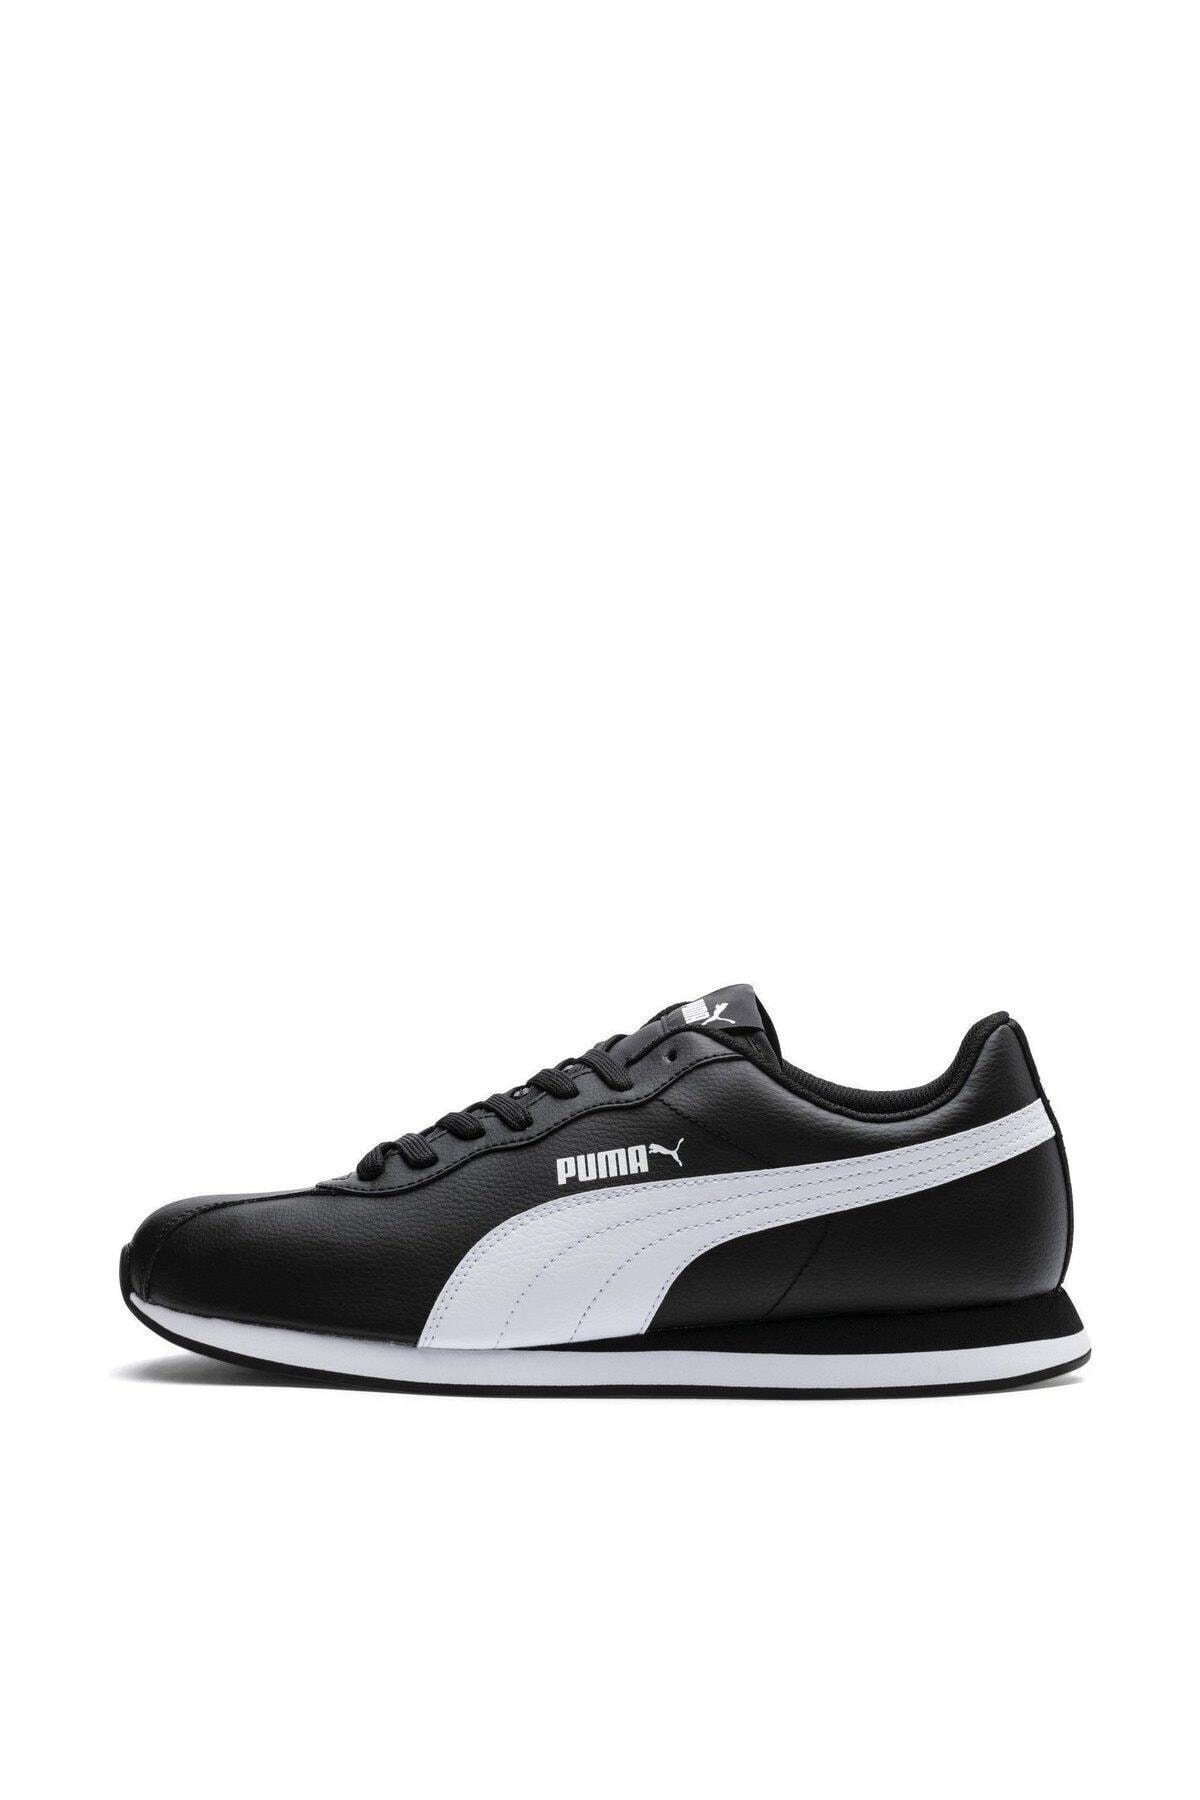 Puma Turin II Siyah  Erkek Spor Ayakkabı (366962-01) 2